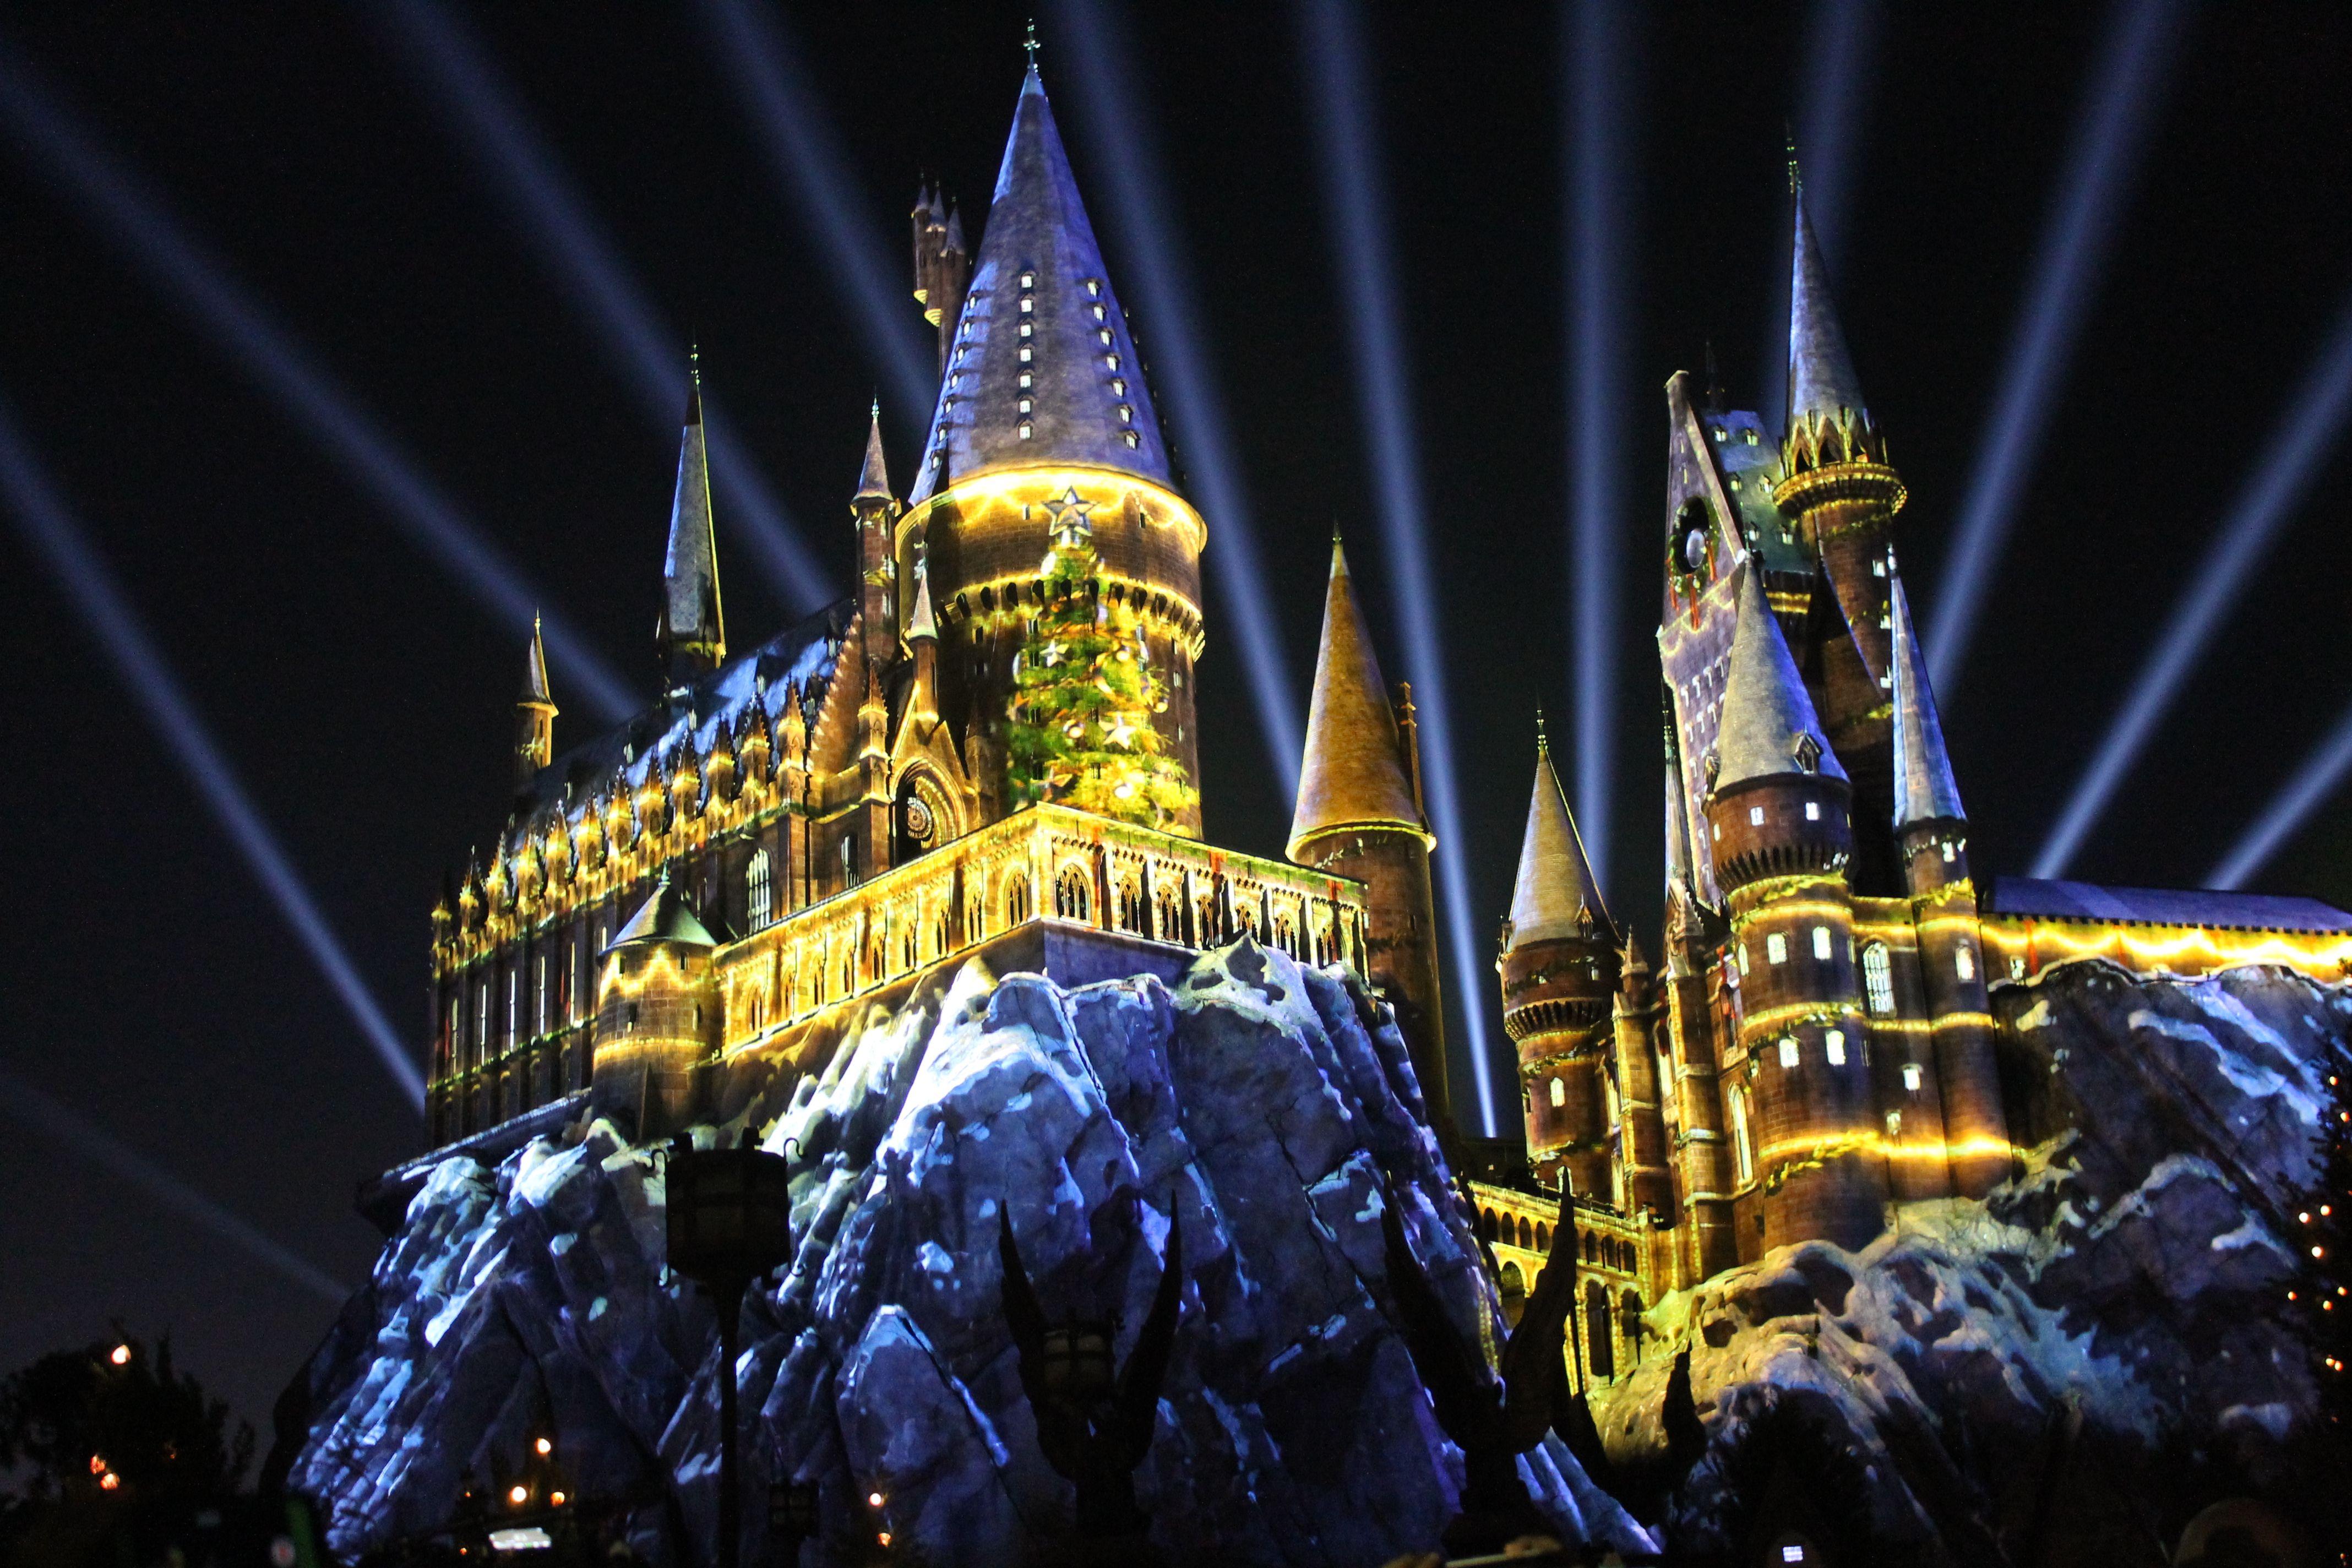 Hogwarts Castle show